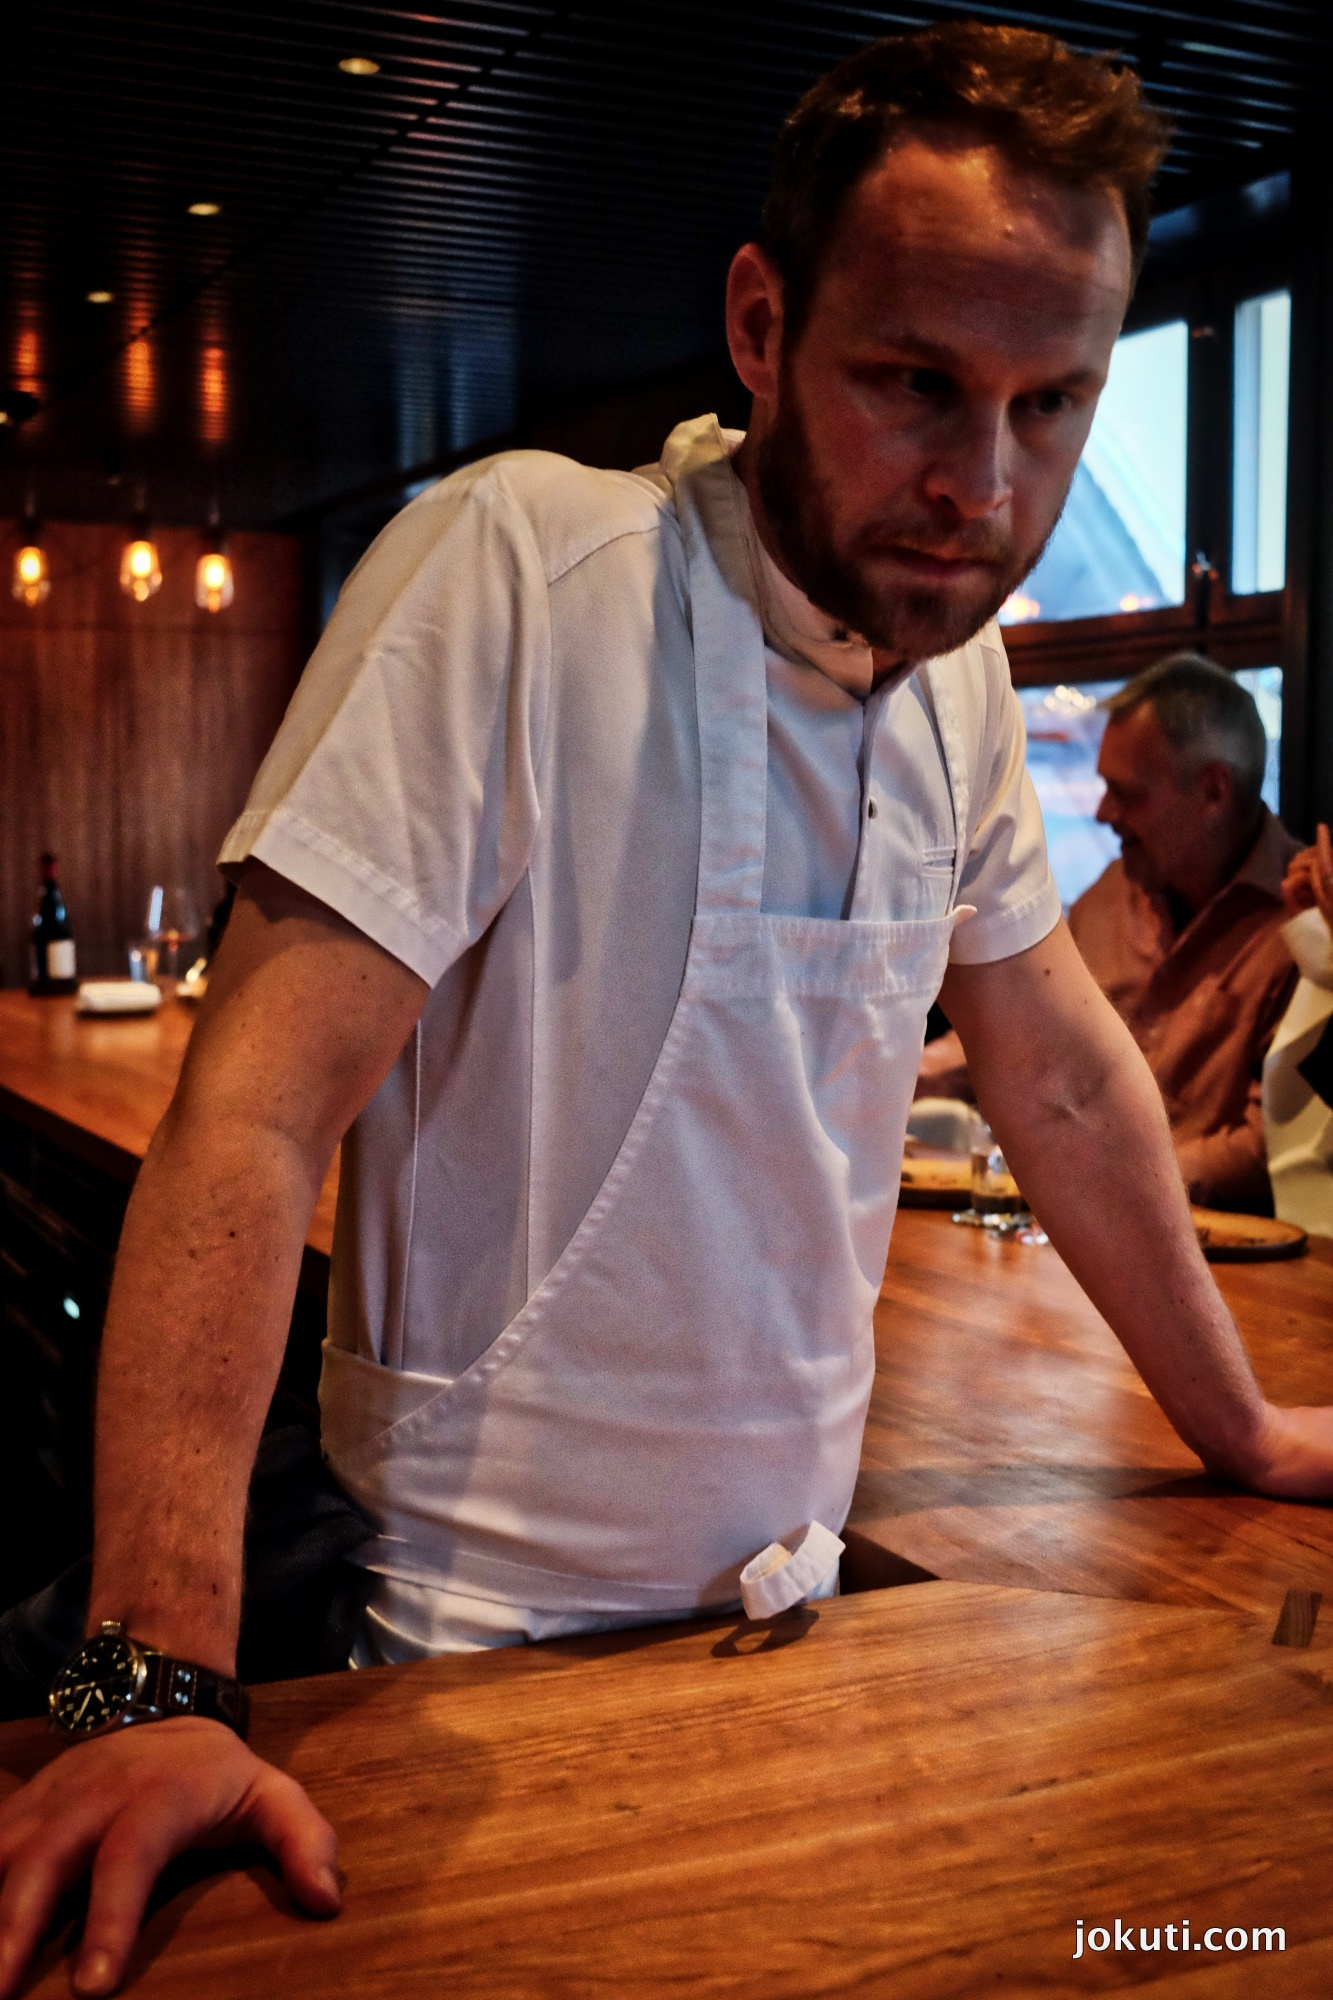 dscf5513_frantzen_stockholm_restaurant_michelin_stars_sweden_vilagevo_jokuti_l.jpg